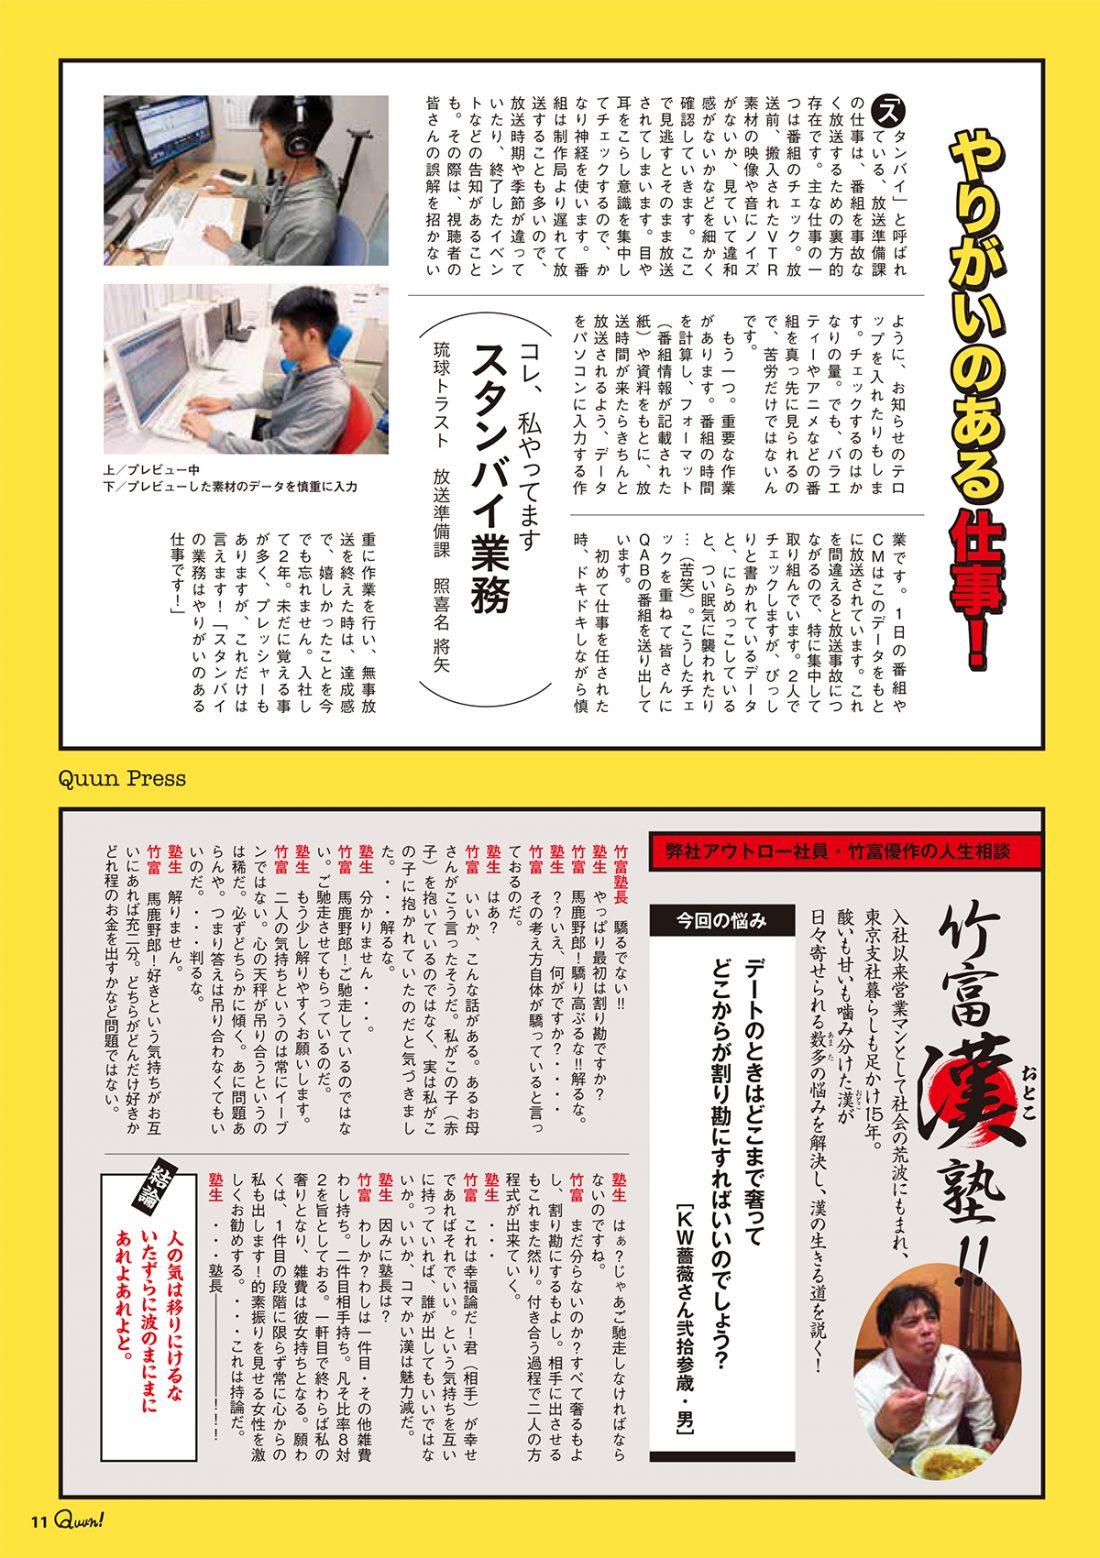 https://www.qab.co.jp/qgoro/wp-content/uploads/quun_0813-1100x1558.jpg